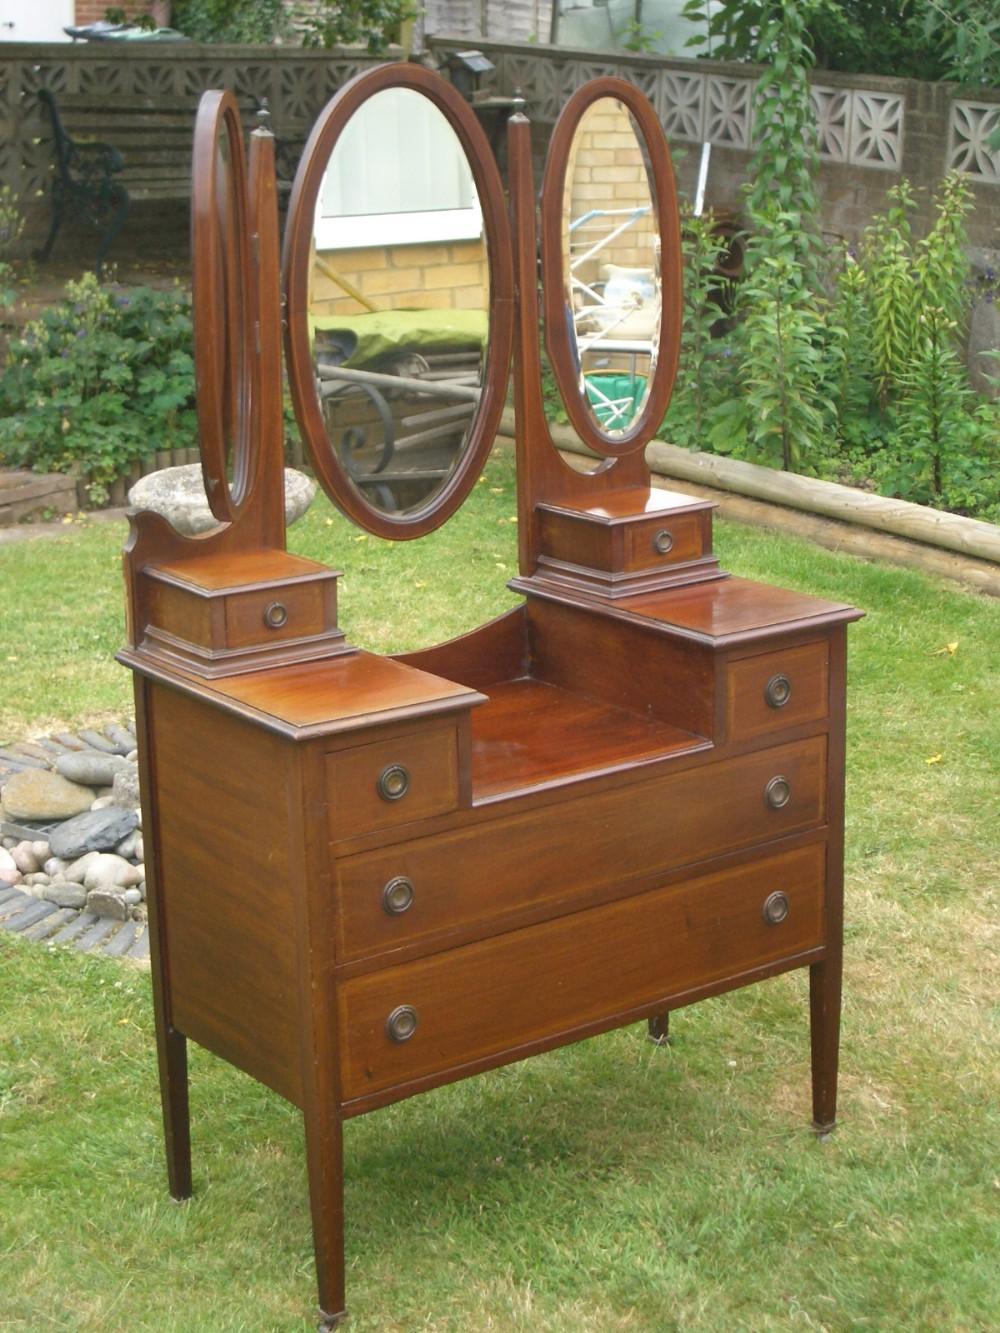 Antique edwardian inlaid mahogany triple mirror dressing